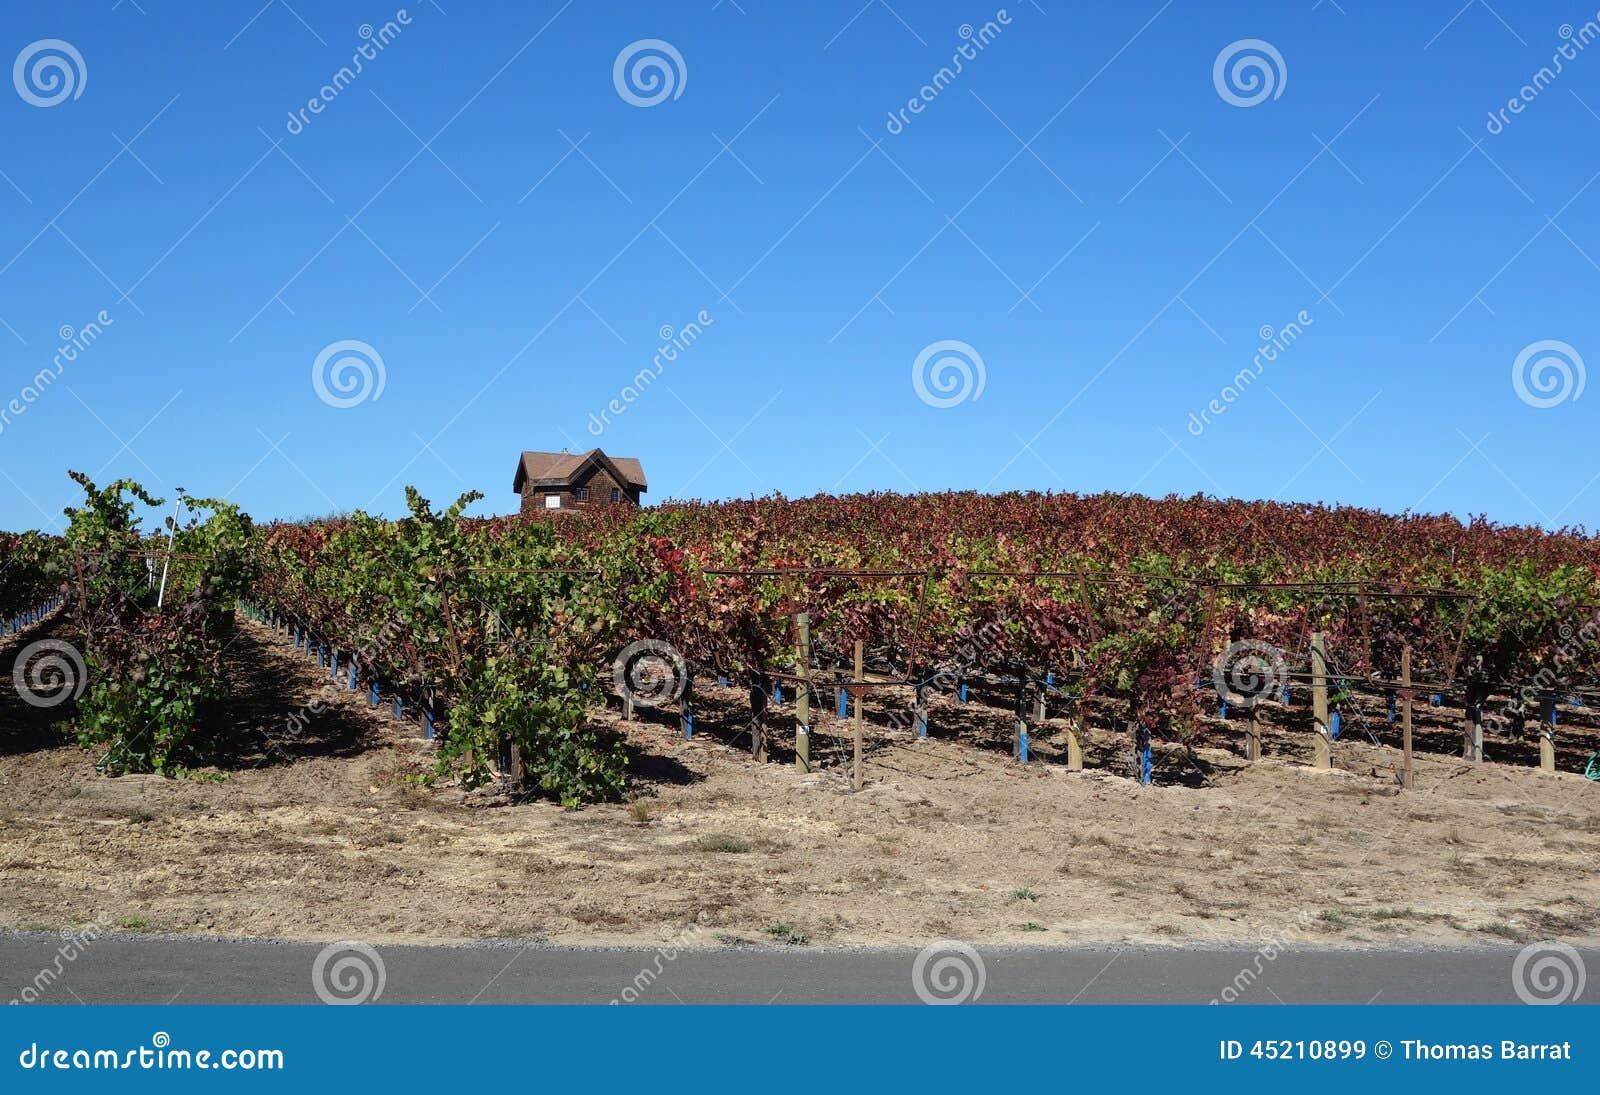 Sonoma Vineyard Stock Photo Image 45210899